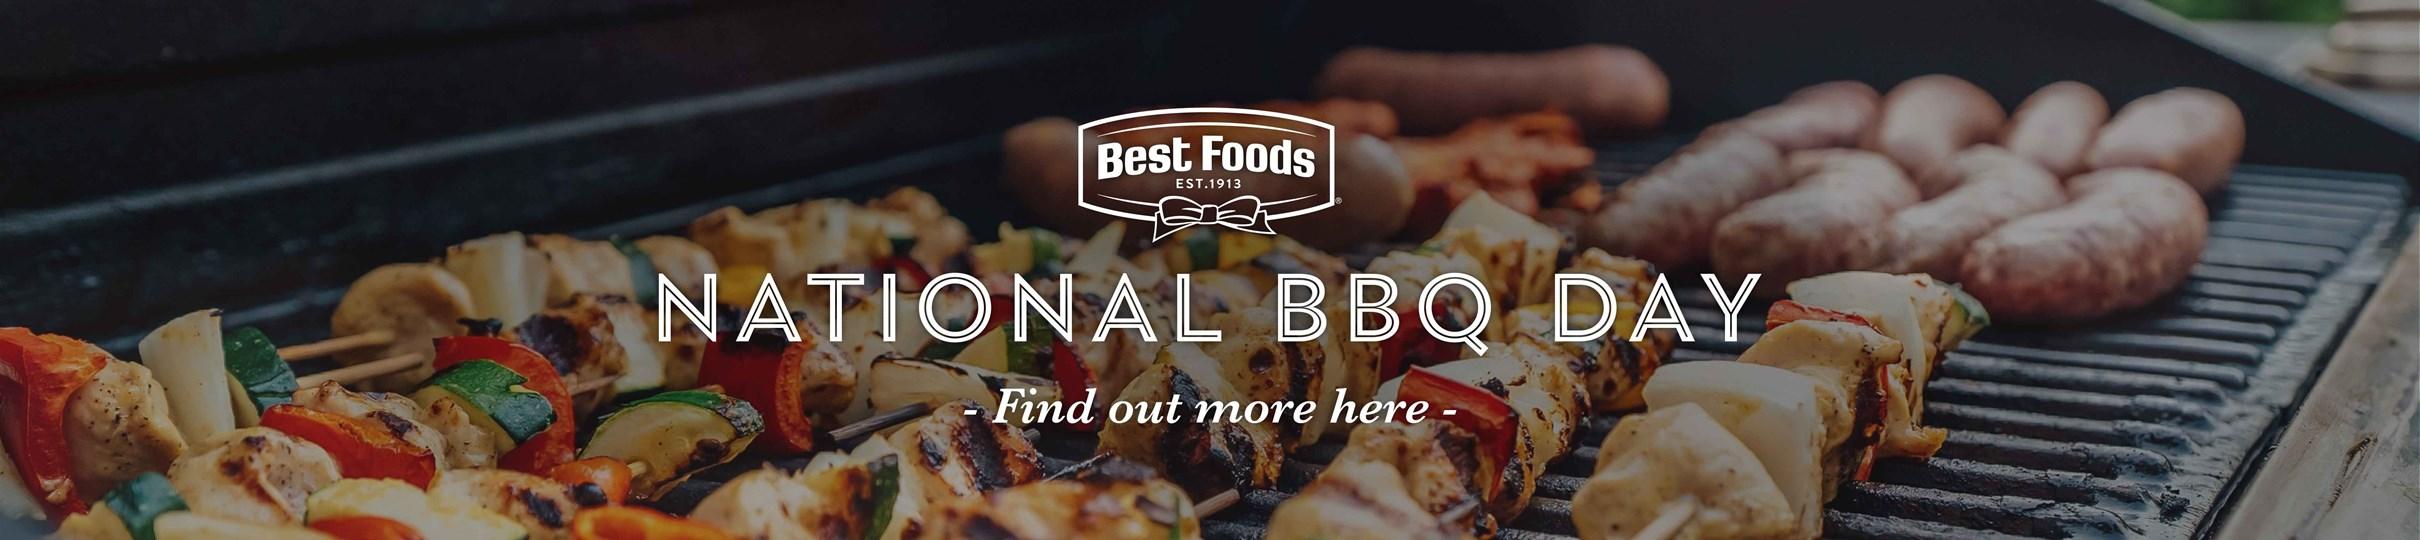 20190201_best-foods_websitebanner.jpg